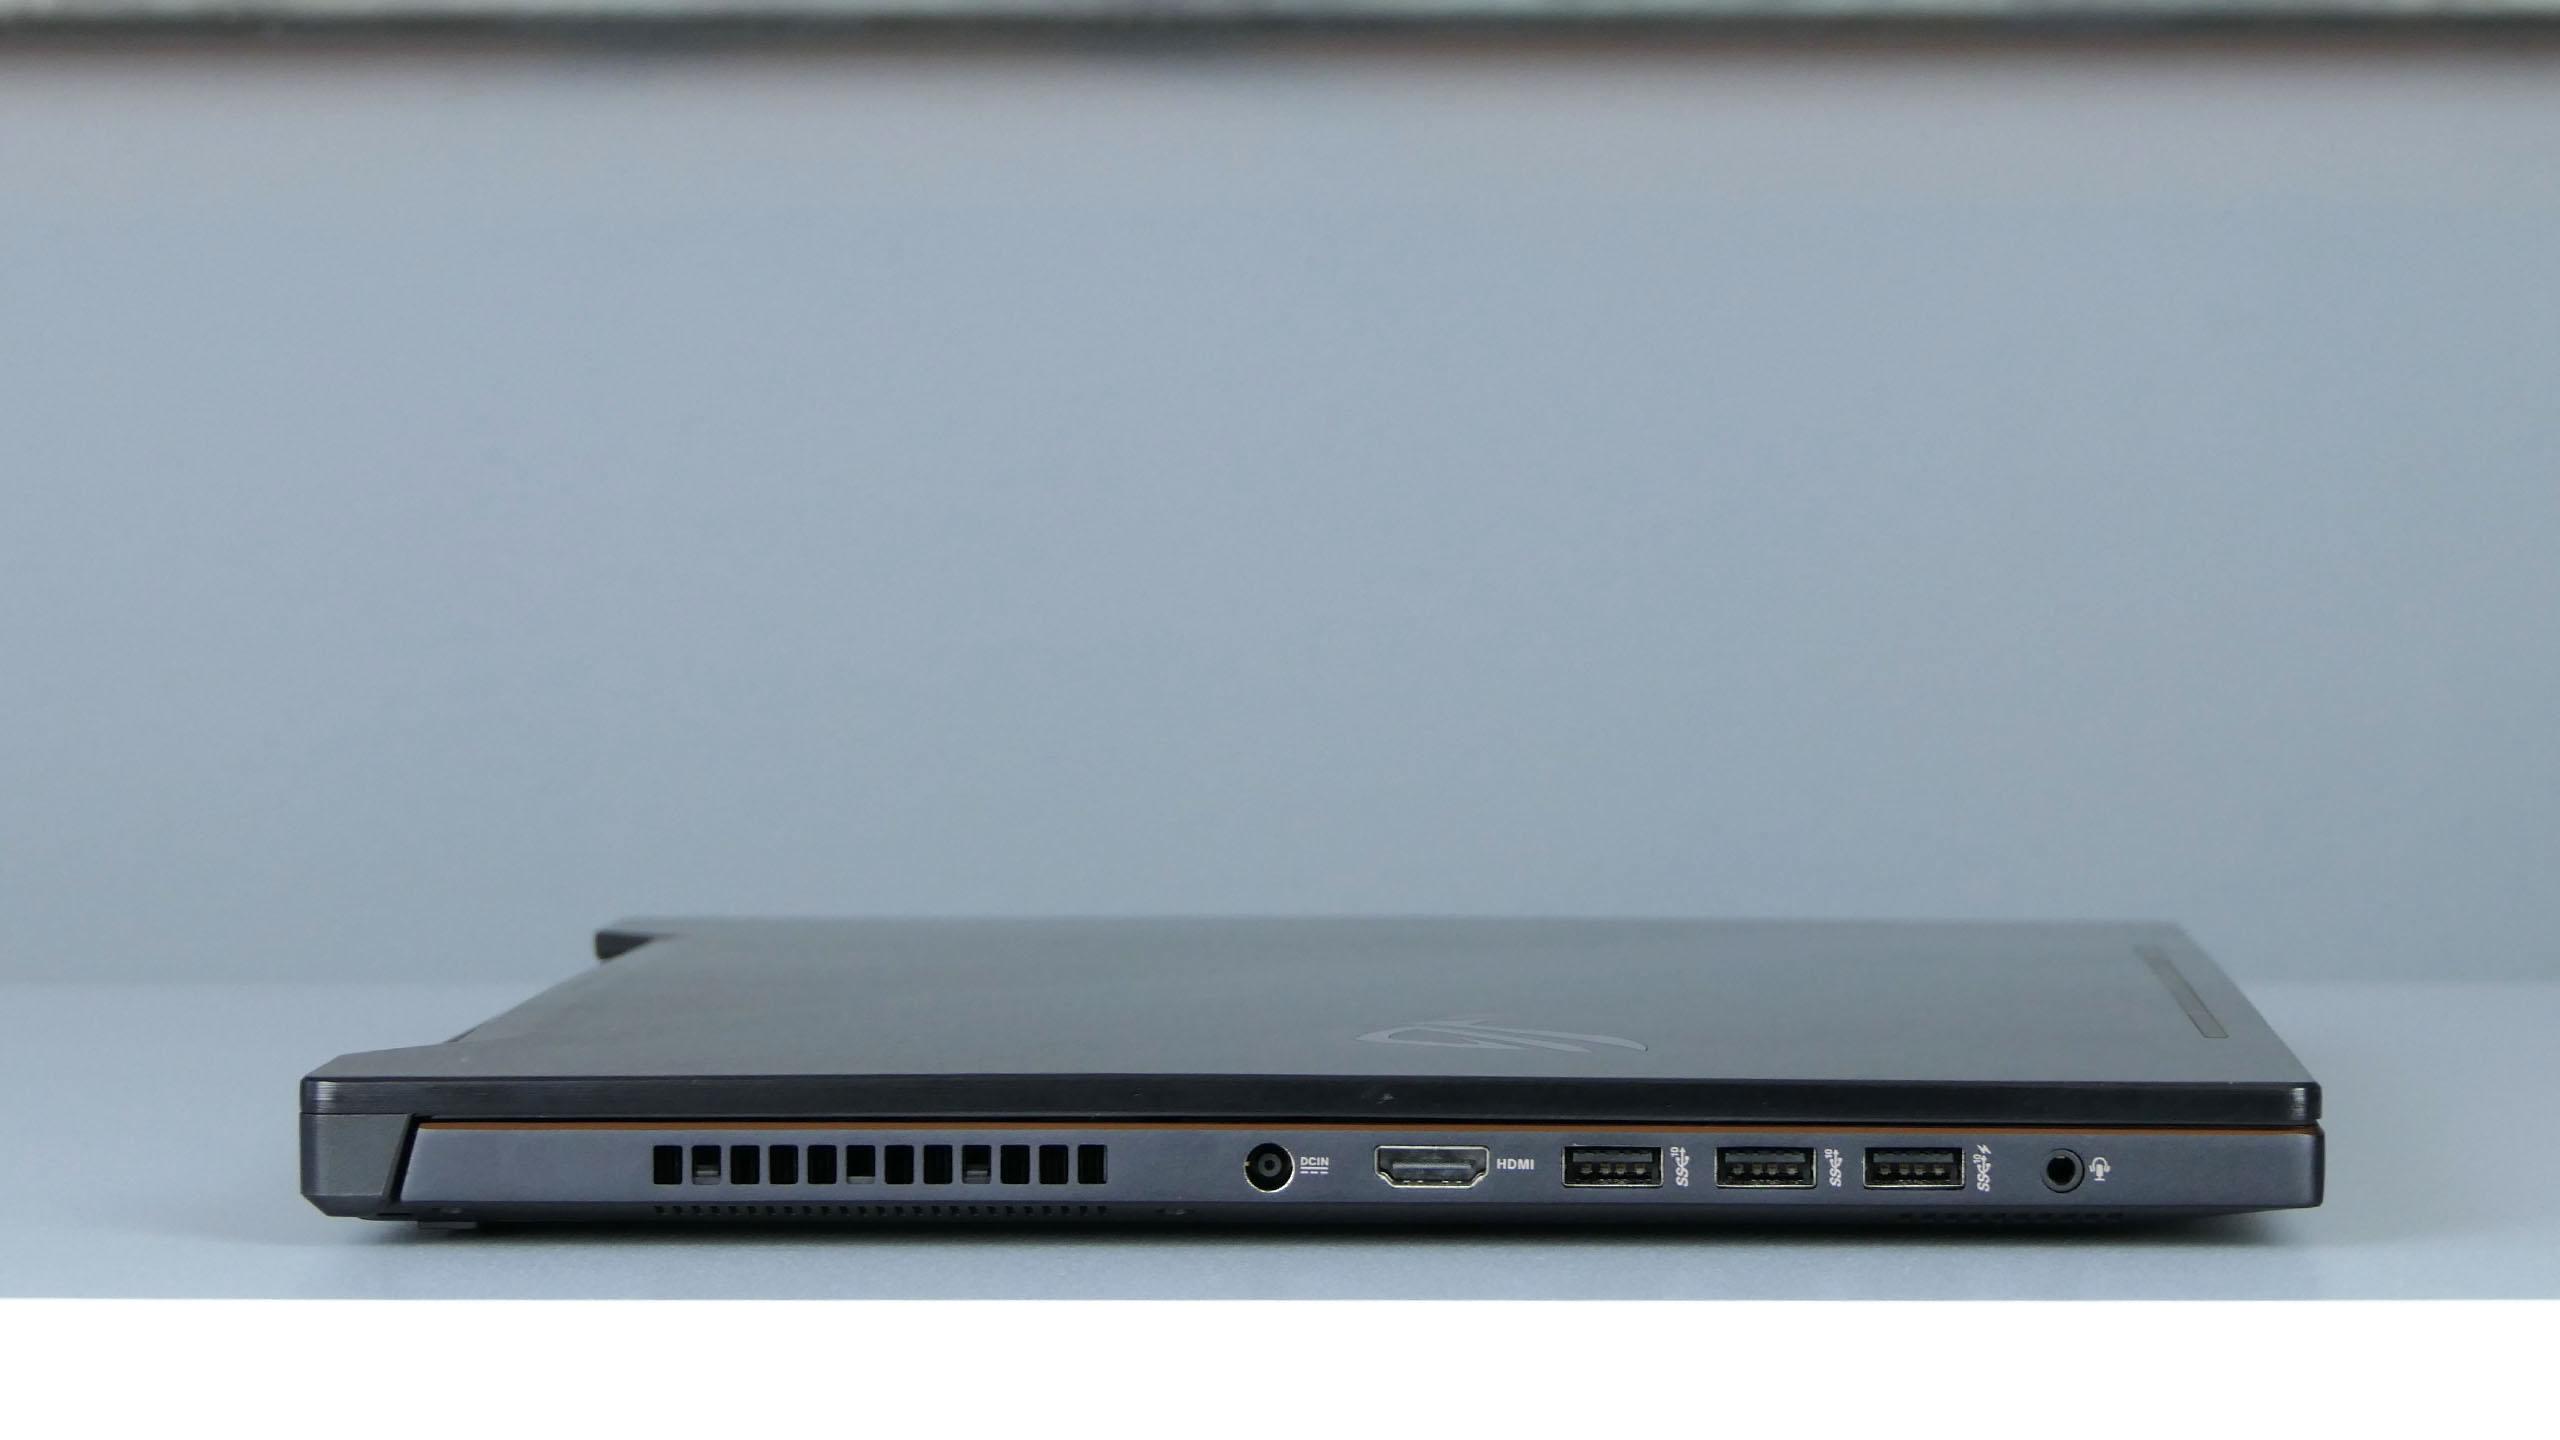 Asus ROG Zephyrus M (GM501) - porty na boku lewym